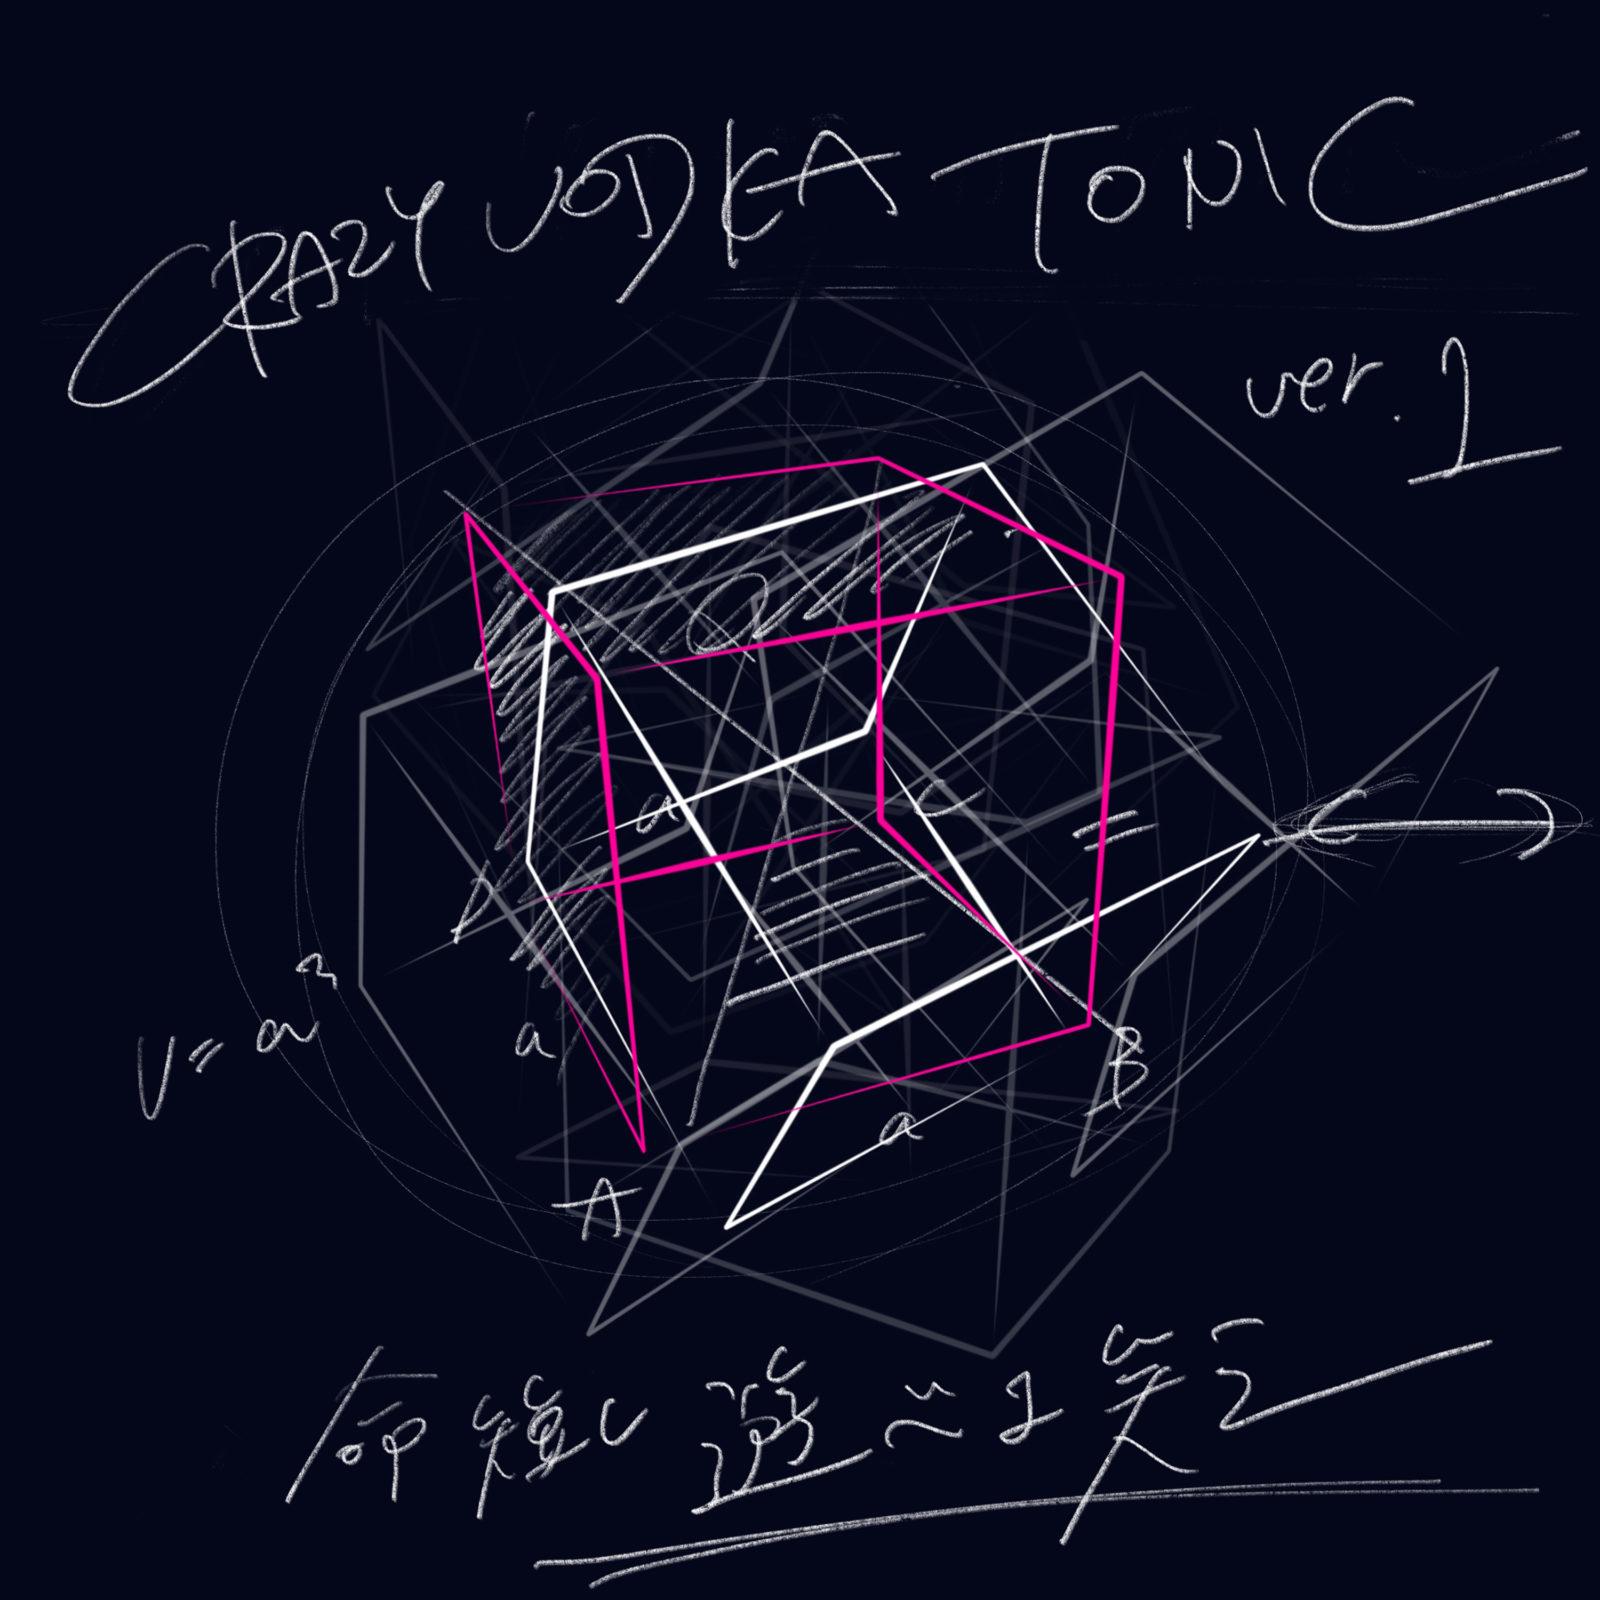 CRAZY VODKA TONIC、音源がアップデートされていく配信限定作品の第2弾をリリース